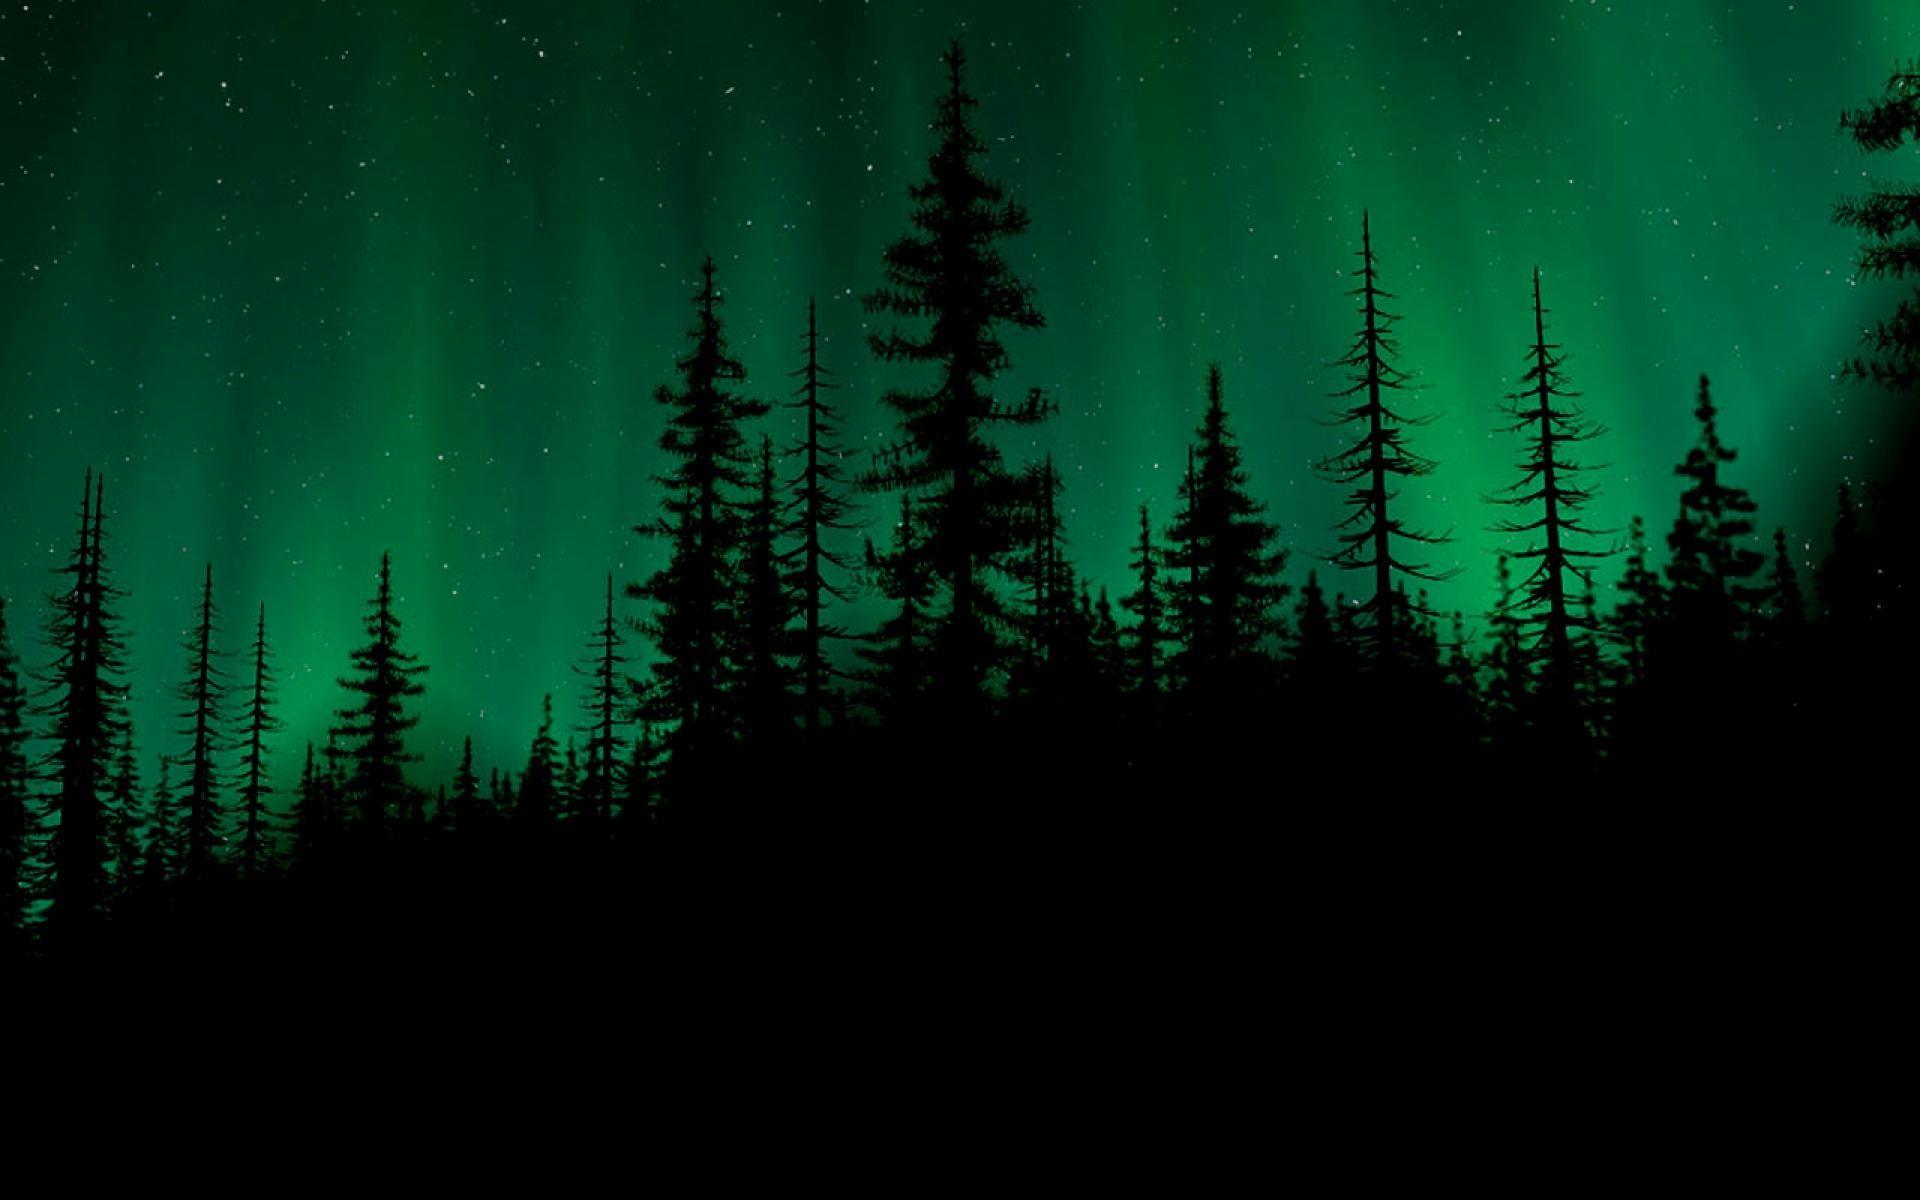 Dark-Woods-Image-Download-Free